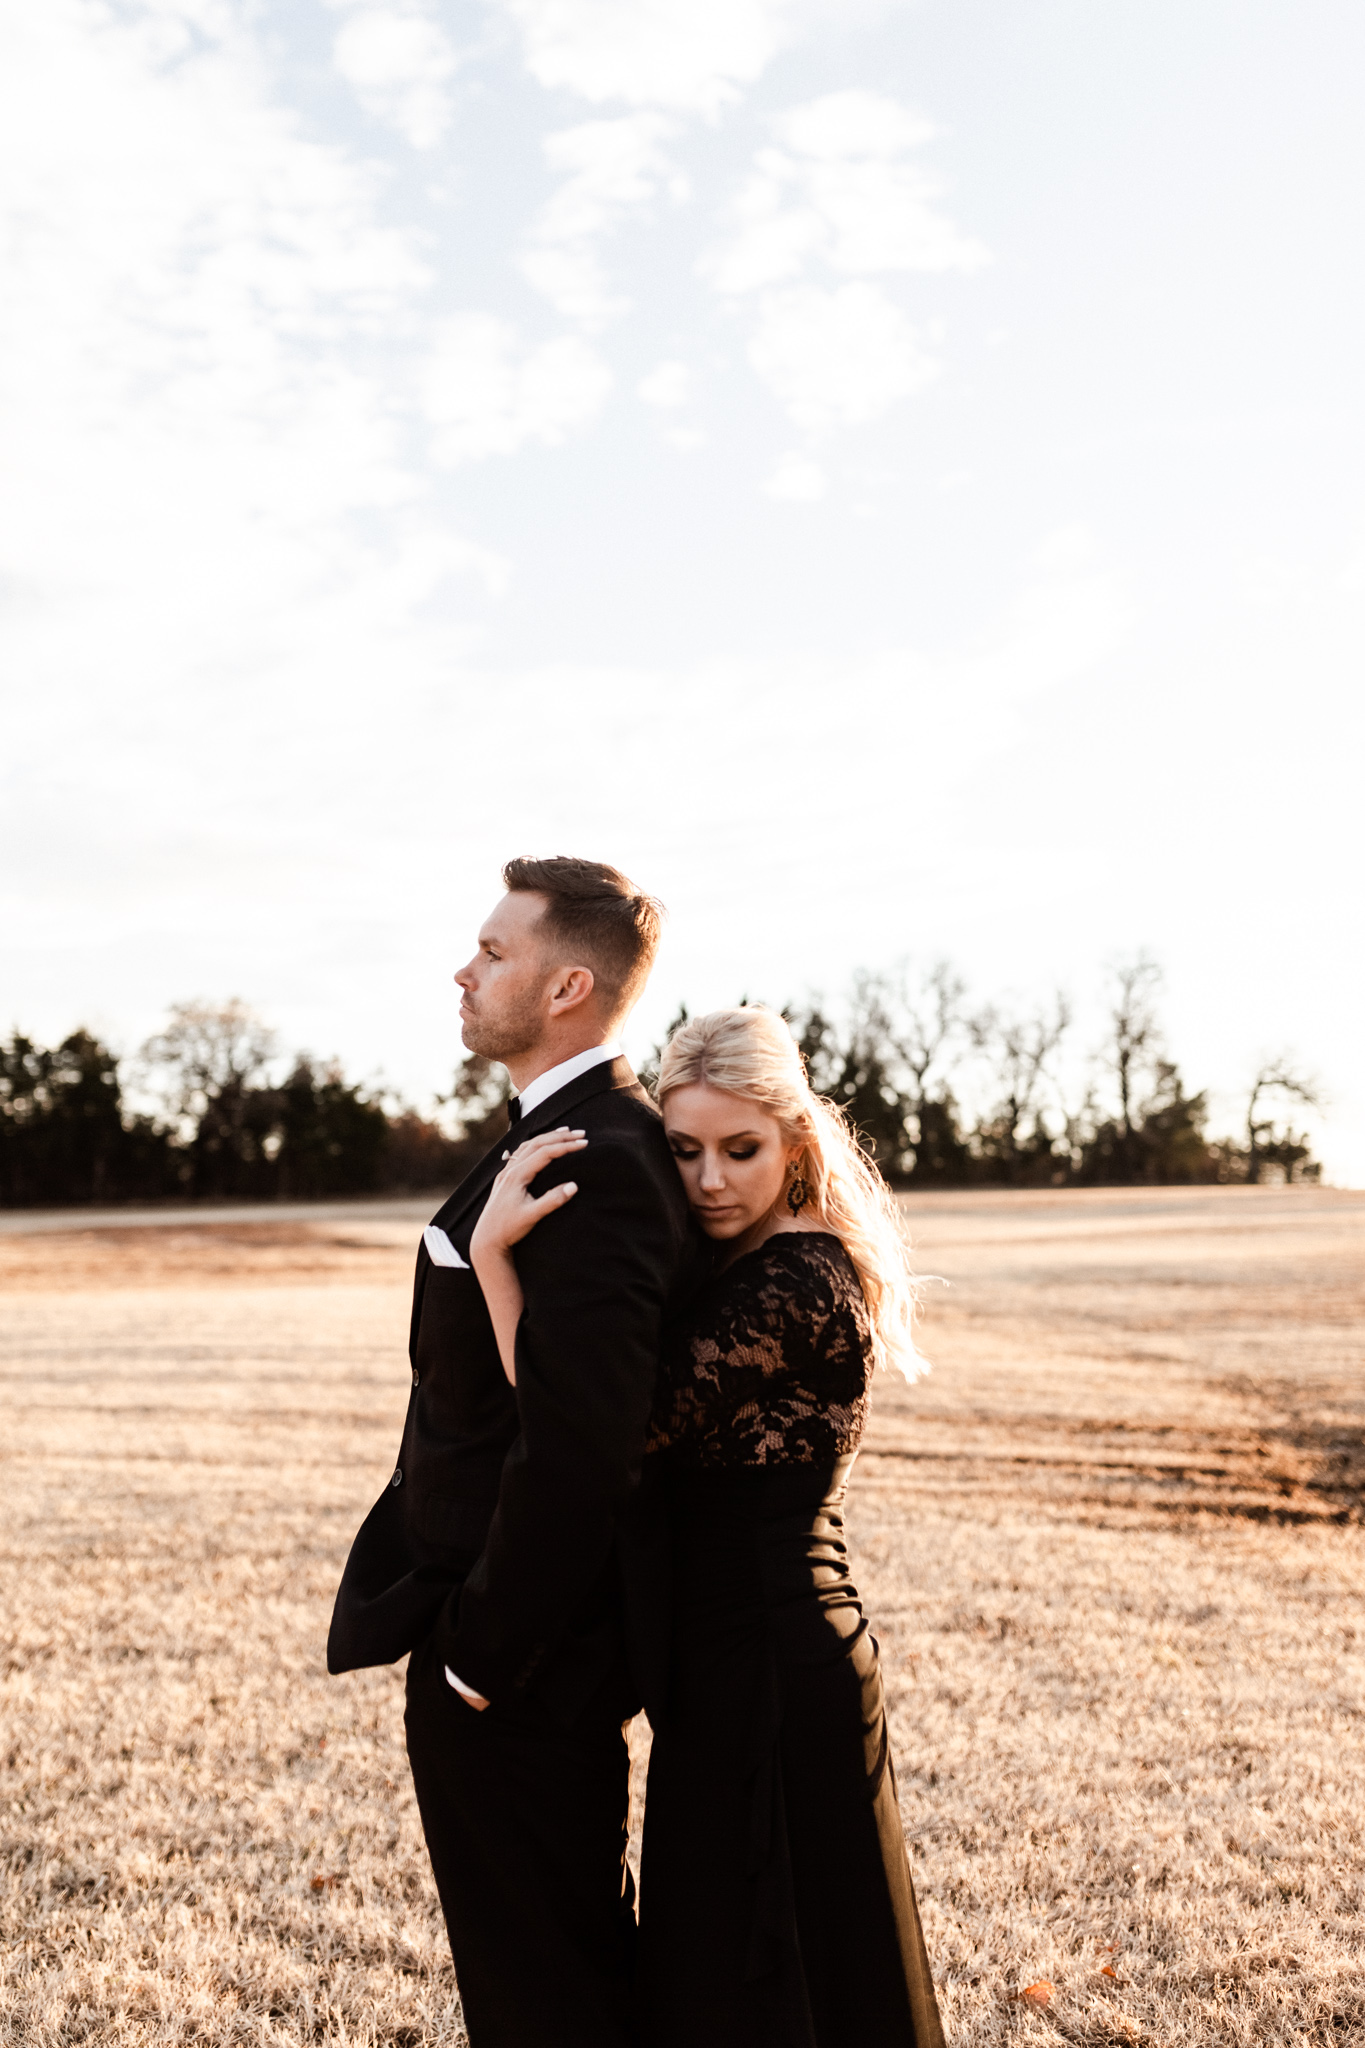 Wade + Stephanie | Warm Open Field Engagements | Oklahoma Wedding Photographer-47.jpg